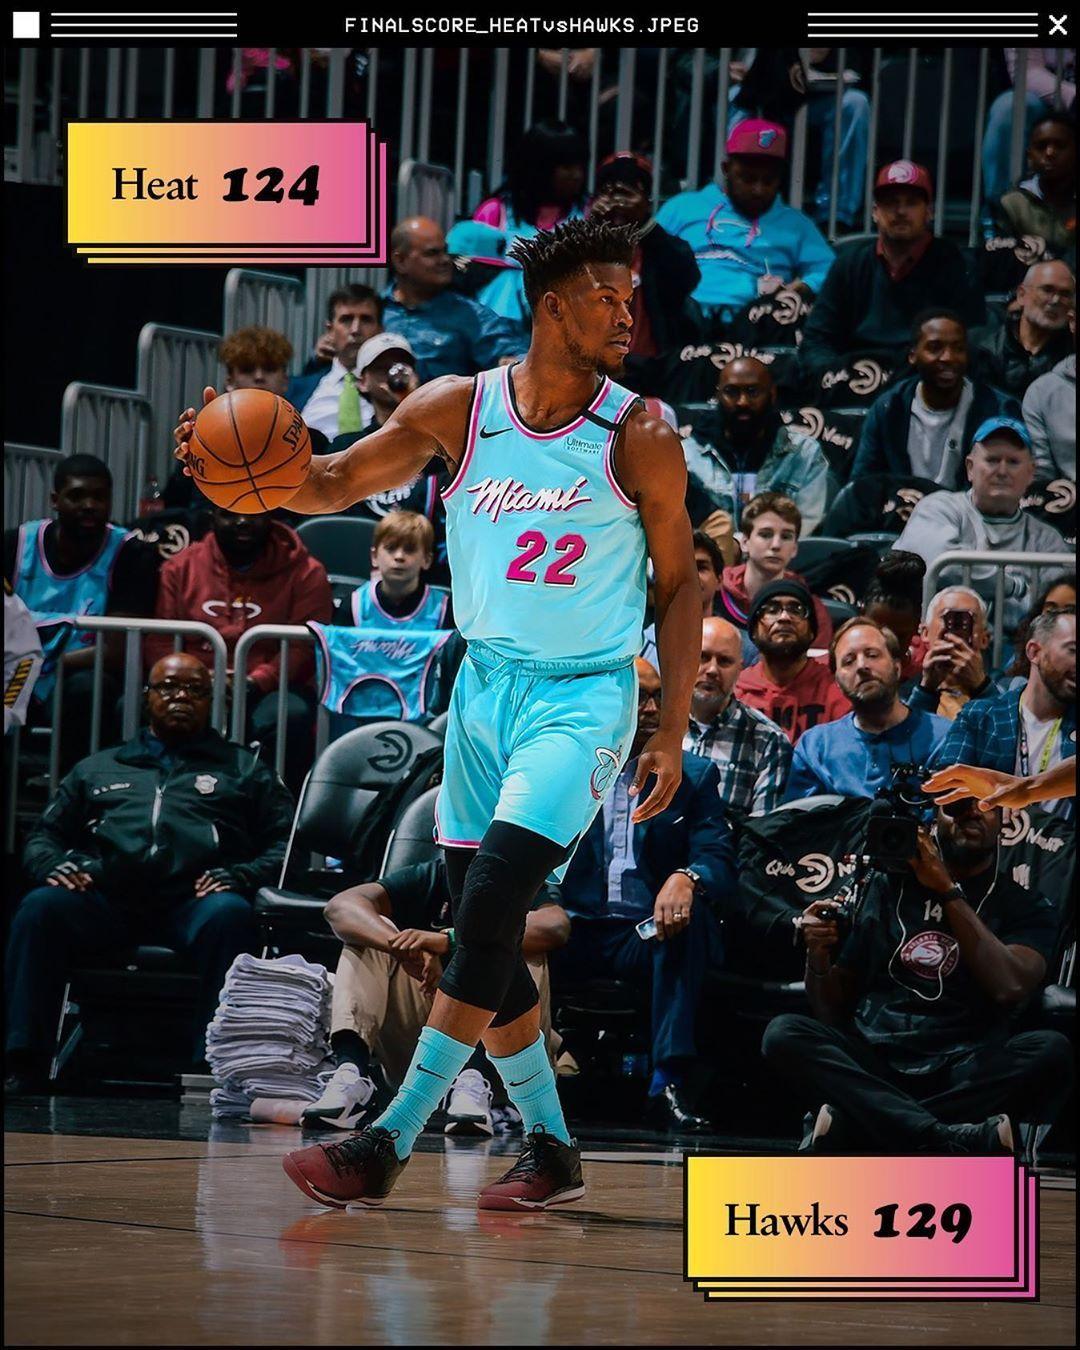 Miami Heat On Instagram In 2020 With Images Miami Heat Miami Heat Game Heat